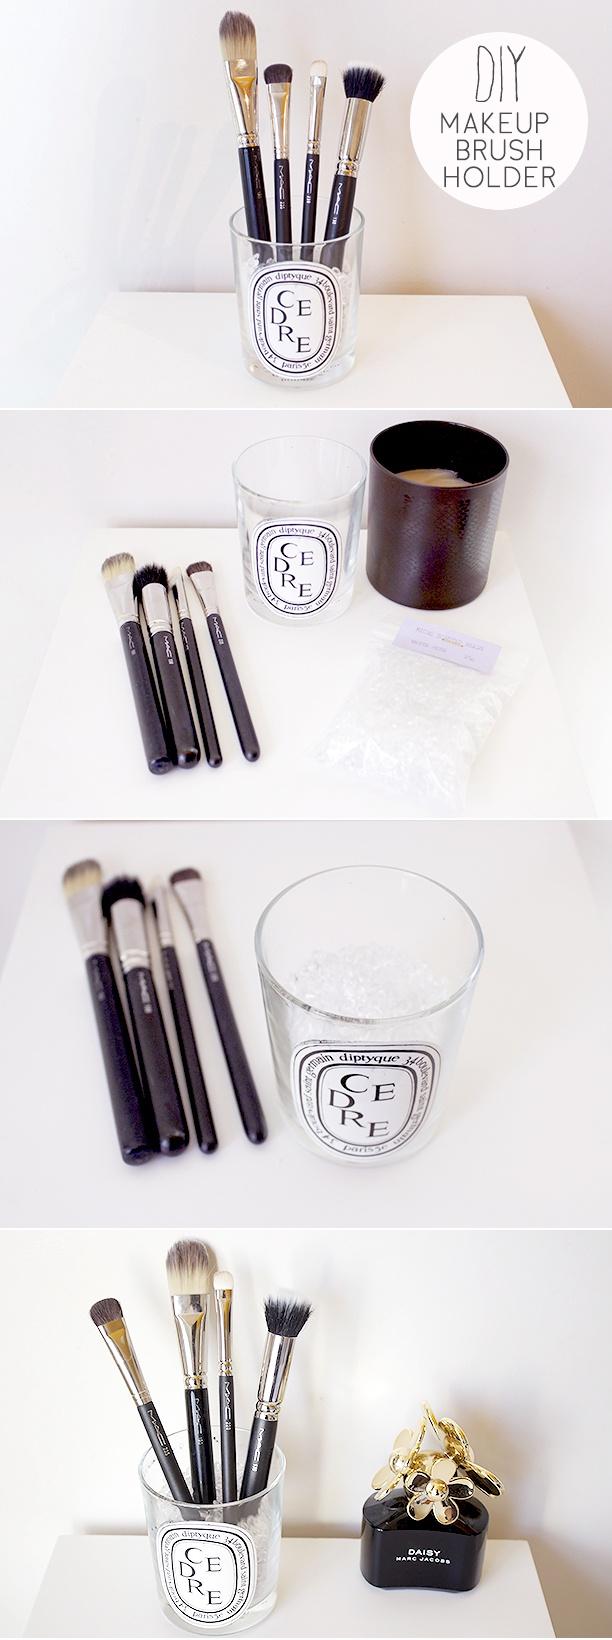 DIY Makeup Brush Holder - Nouvelle Daily